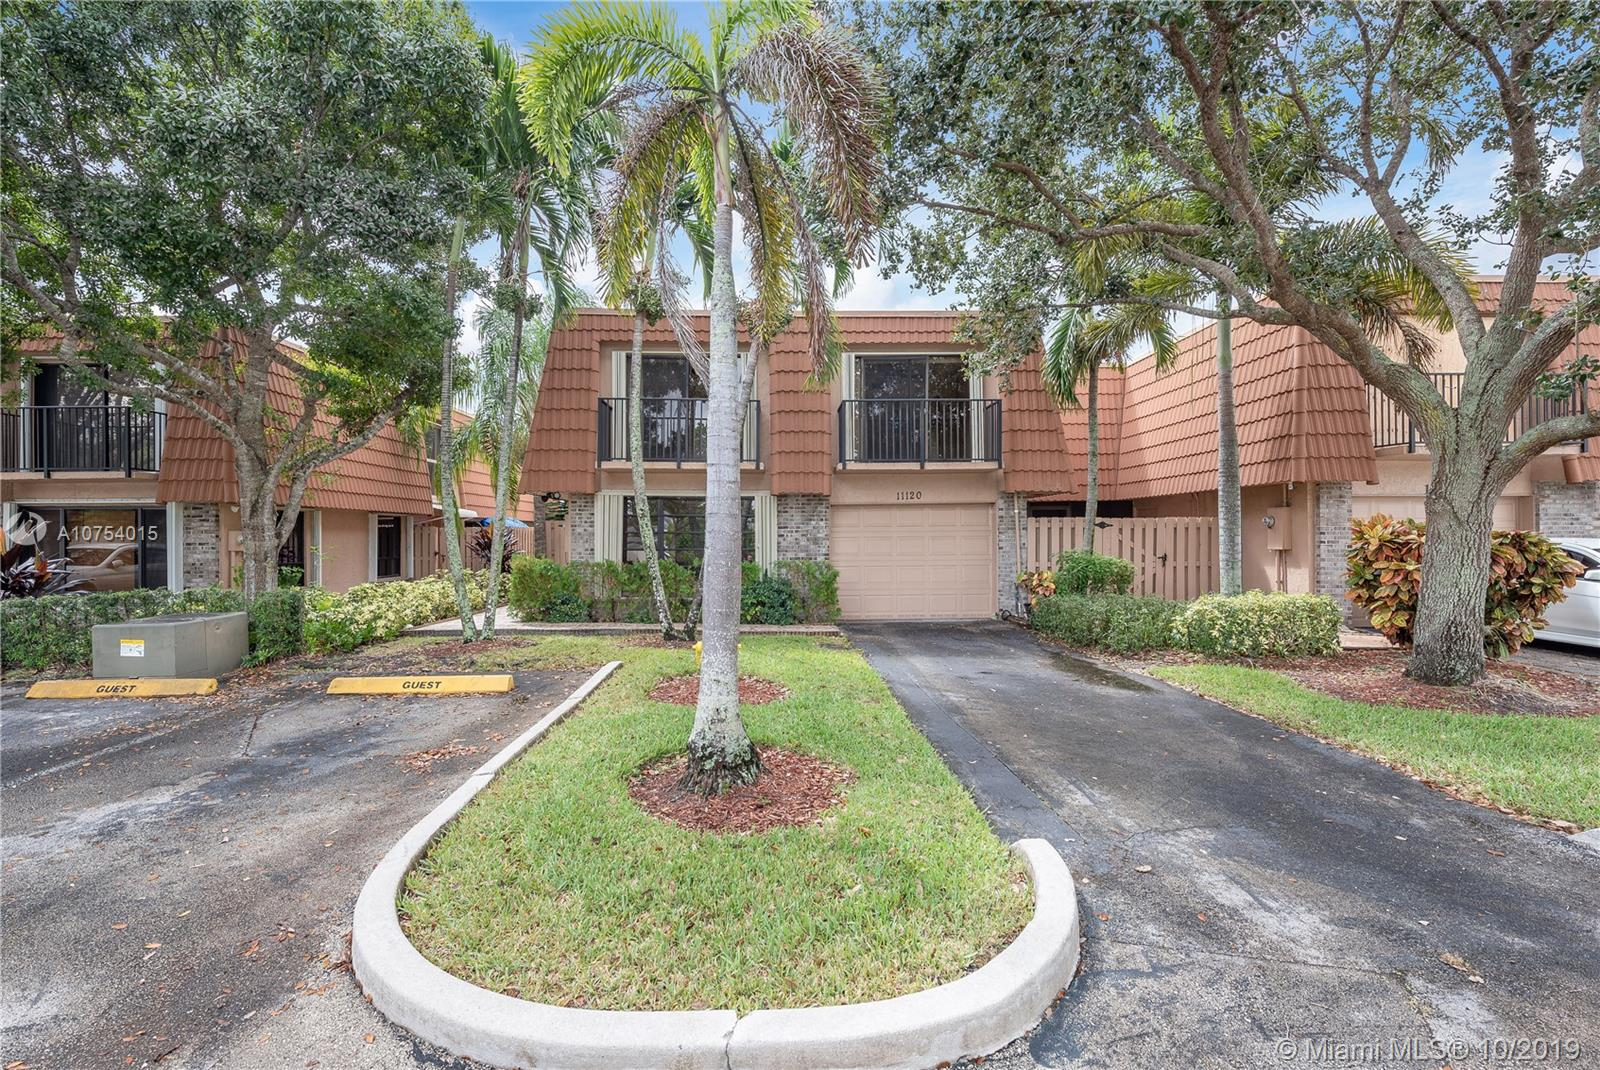 Property for sale at 11120 N Harmony Lake Cir, Davie FL 33324, Davie,  Florida 33324